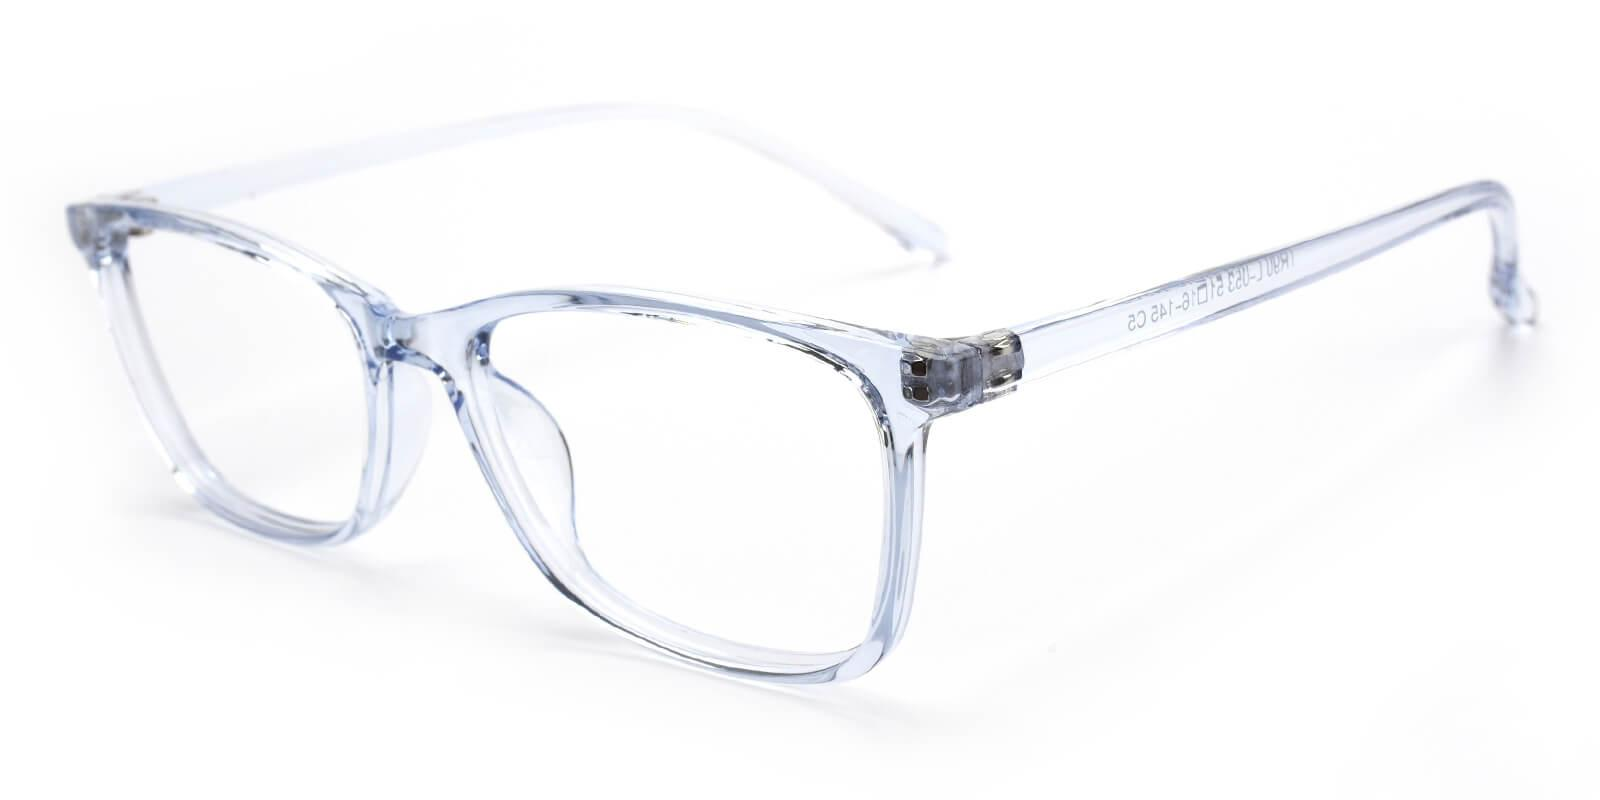 Suofia-Blue-Cat-TR-Eyeglasses-additional1